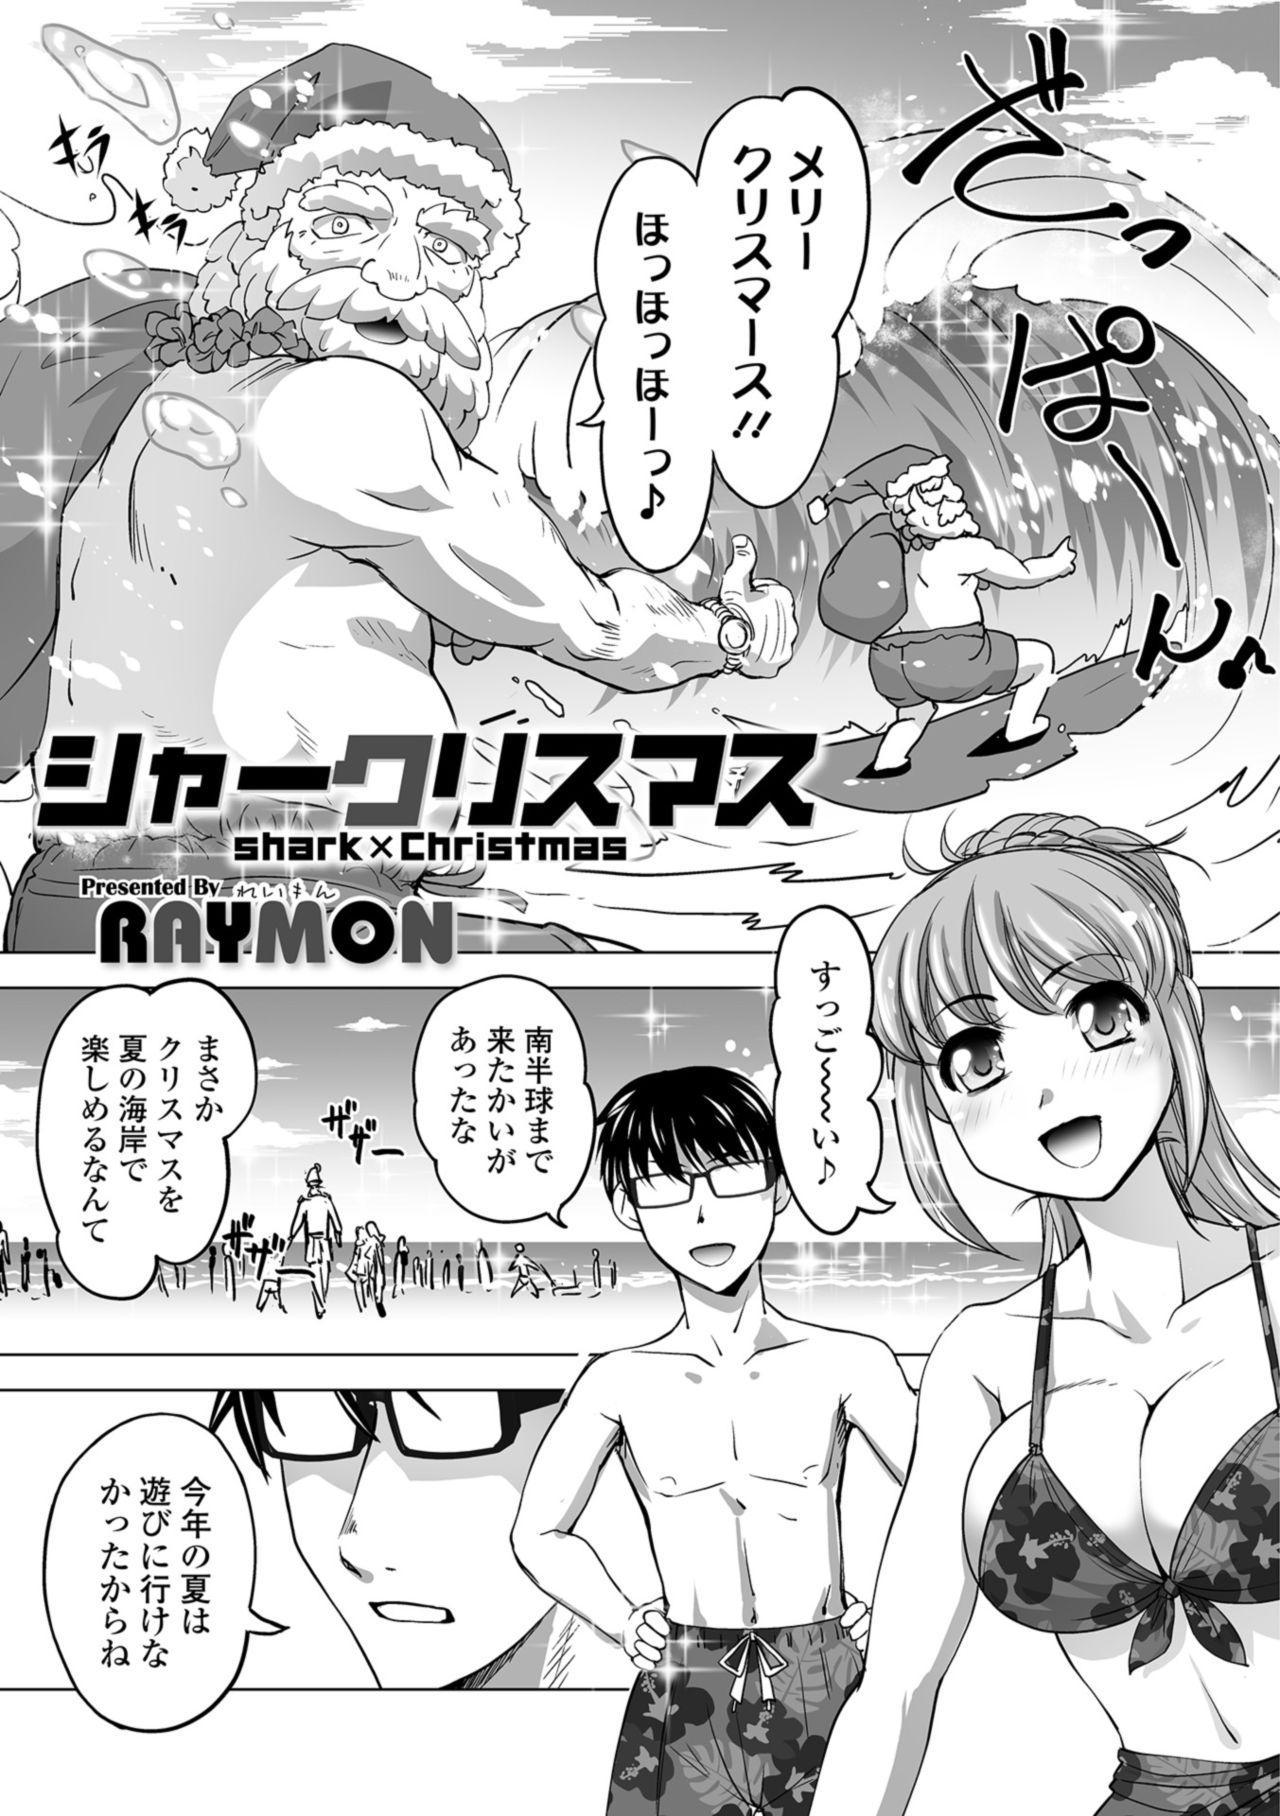 COMIC Shigekiteki SQUIRT!! Vol. 09 120